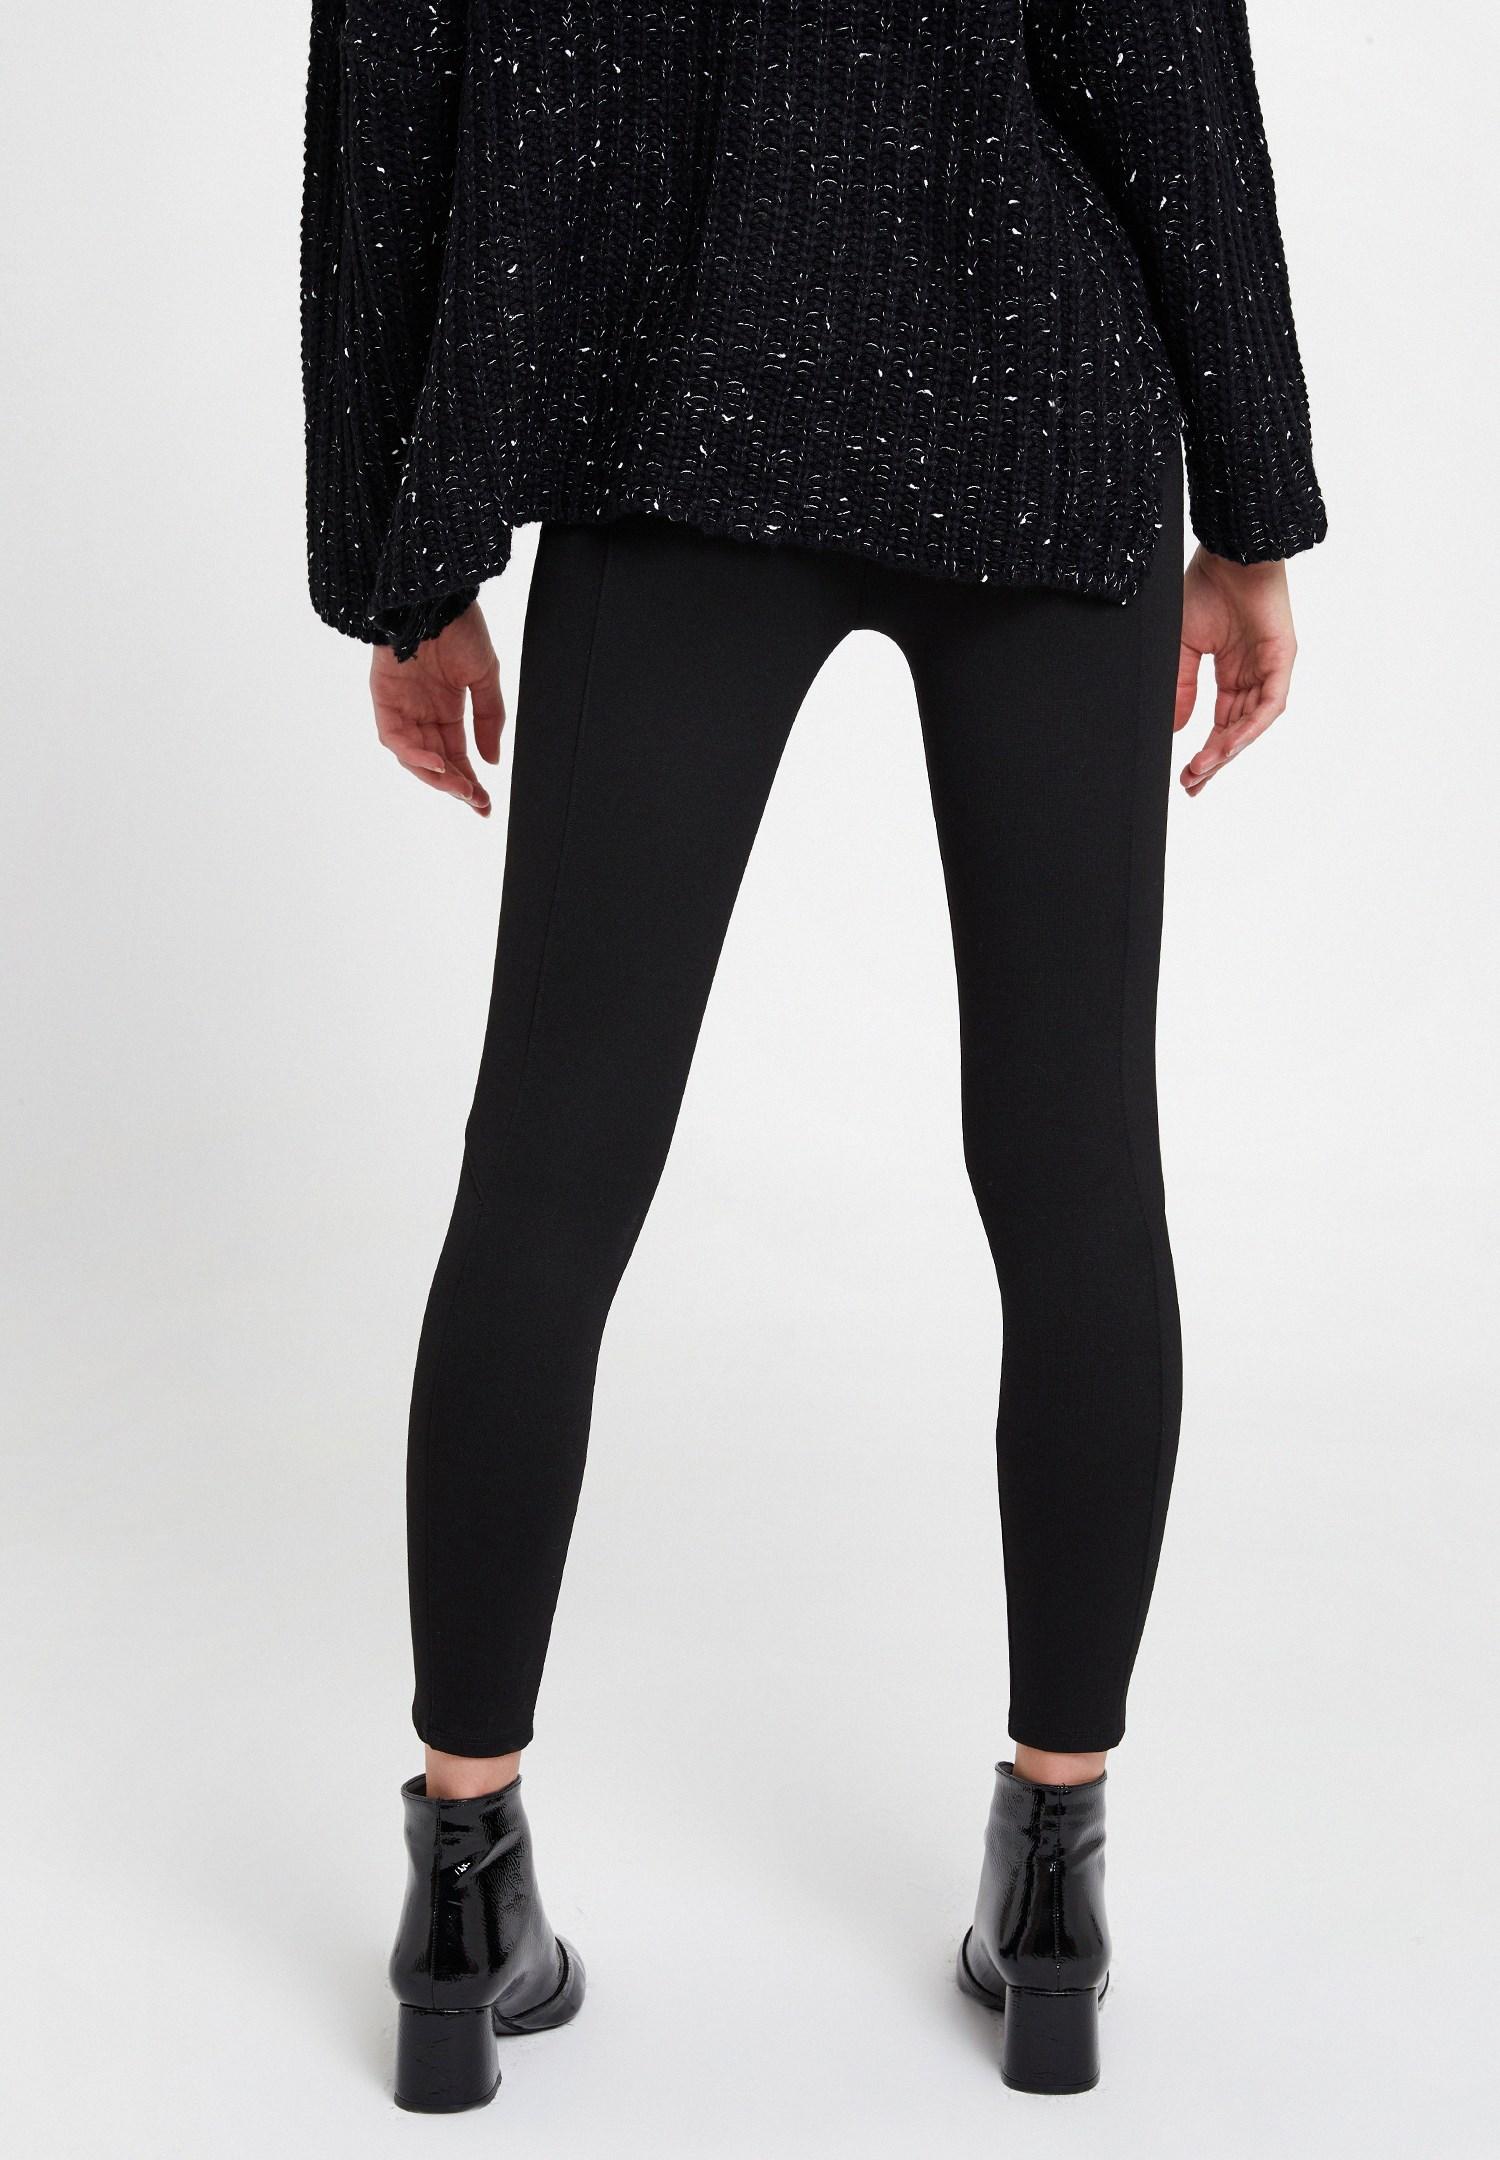 Women Black Leggings with Zip Pocket